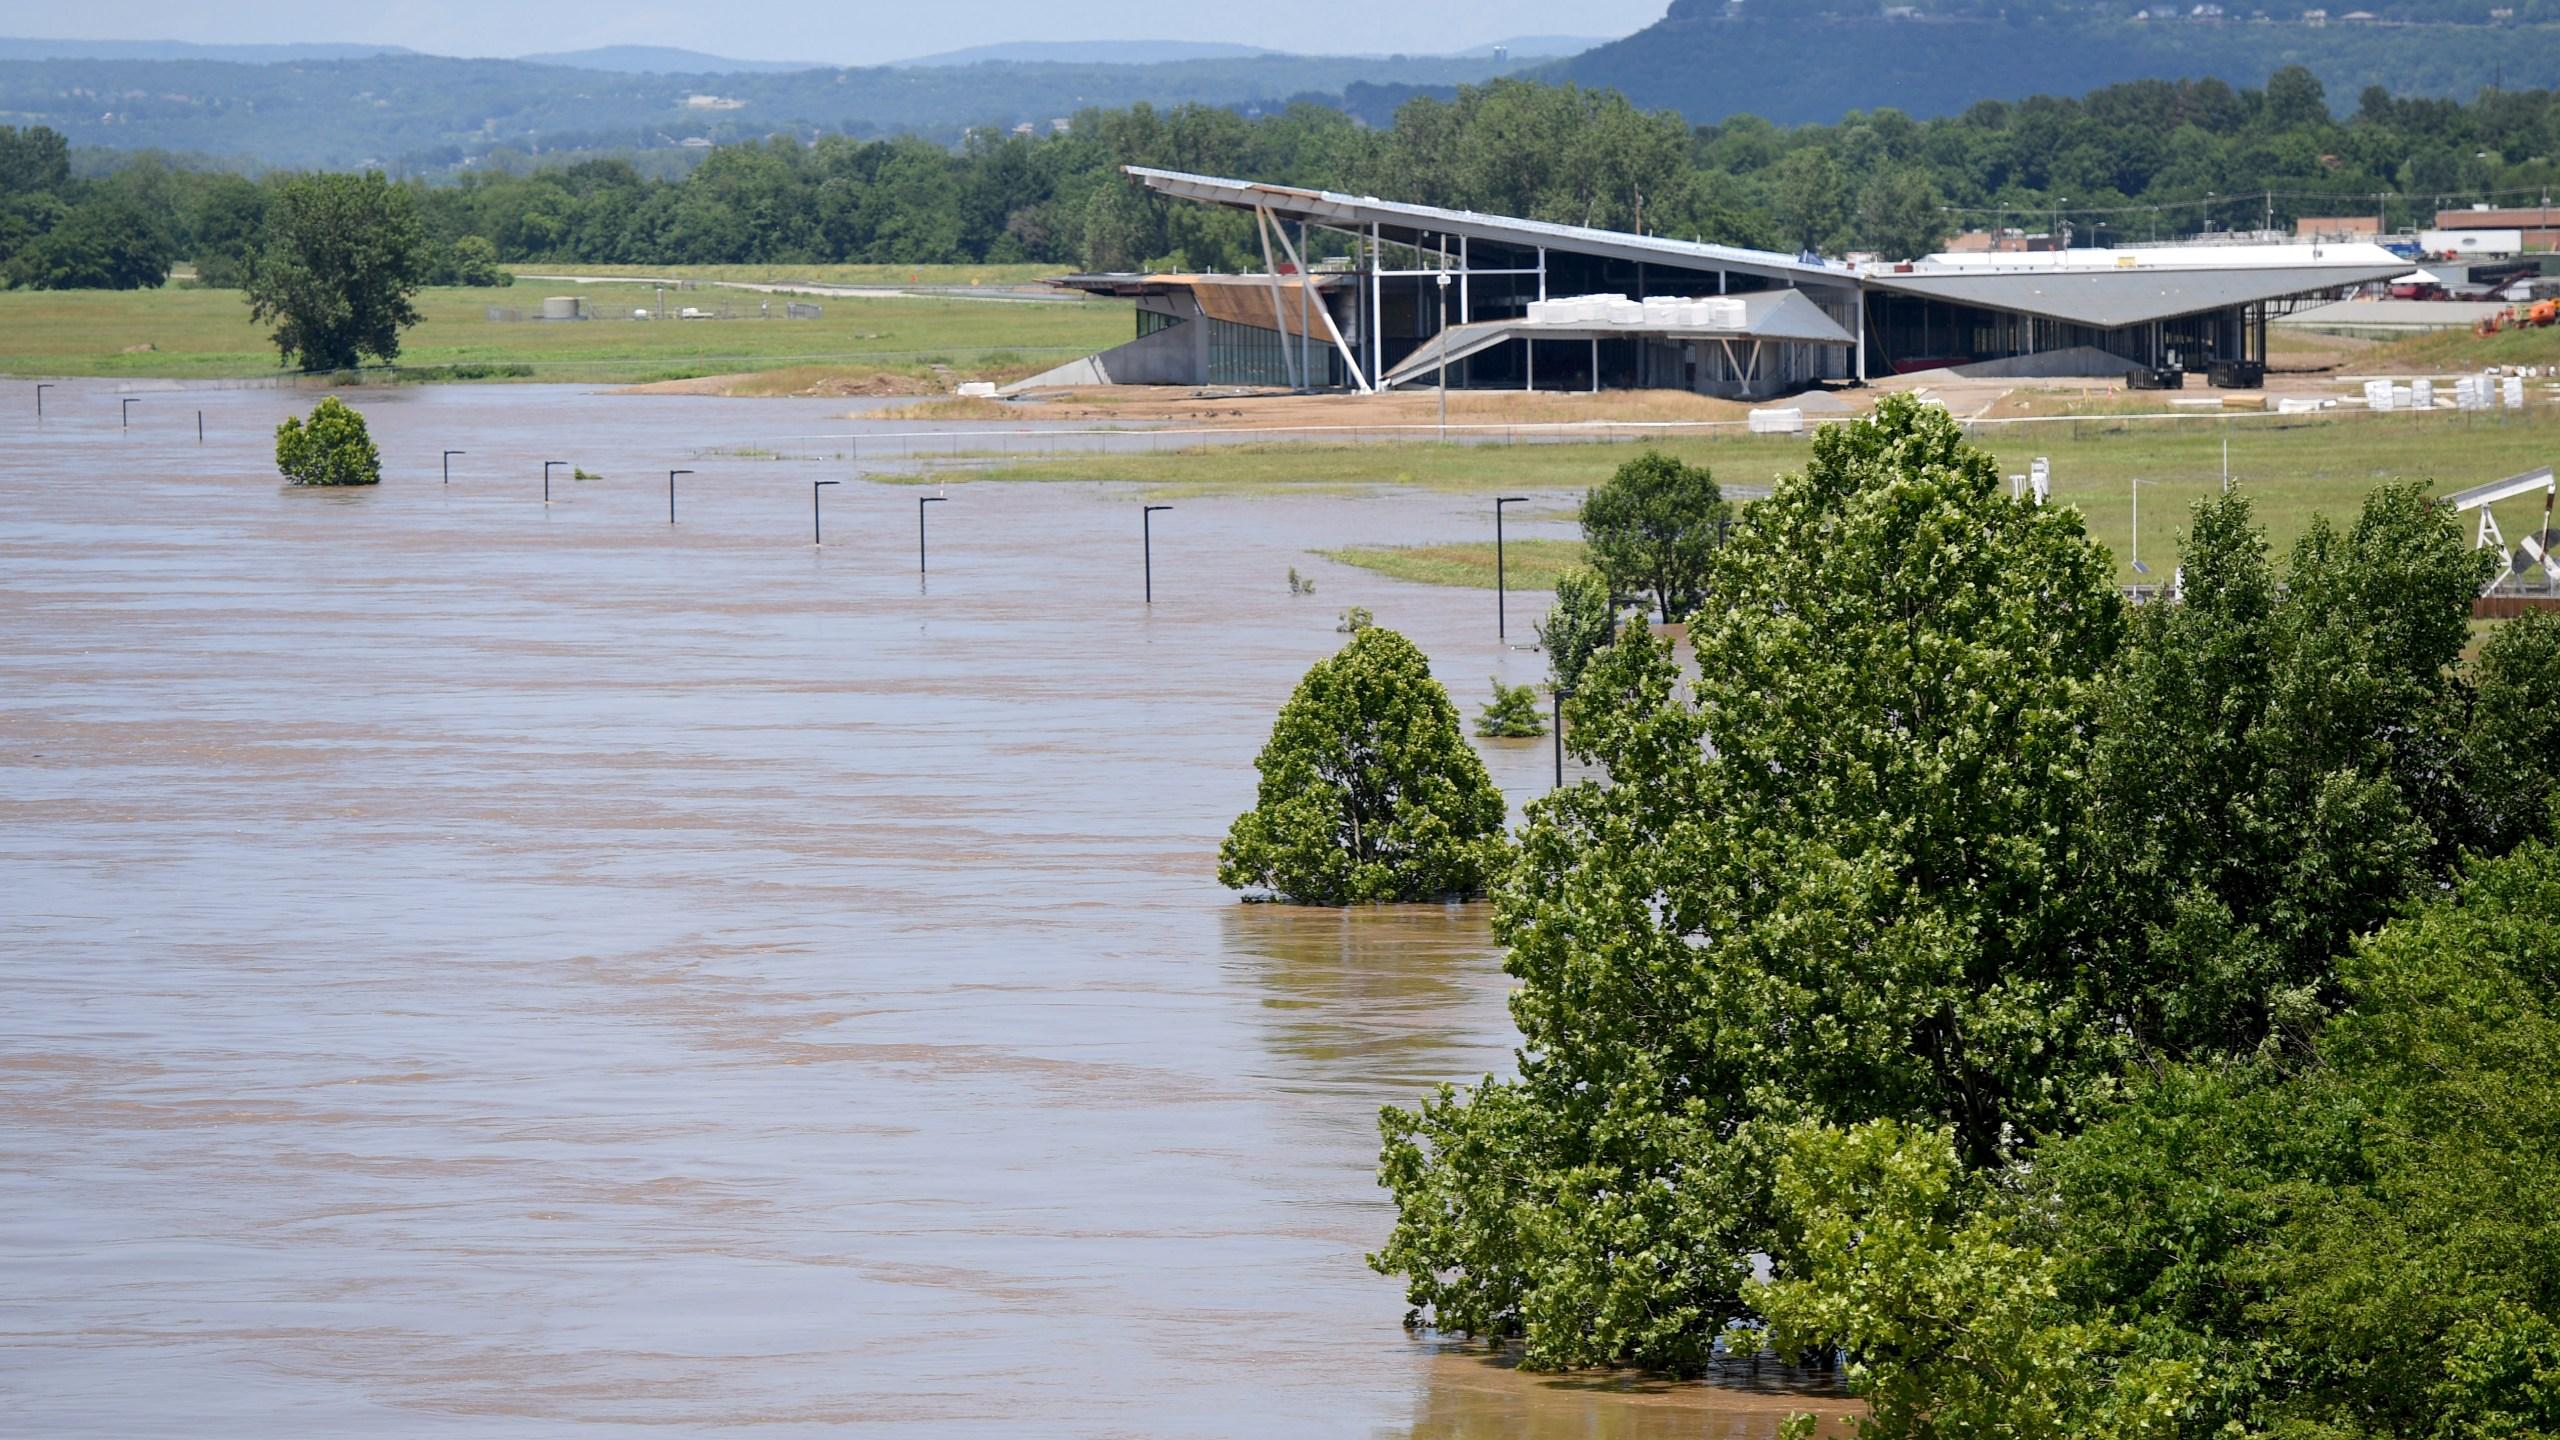 Spring_Flooding_Arkansas_13793-159532.jpg55217878